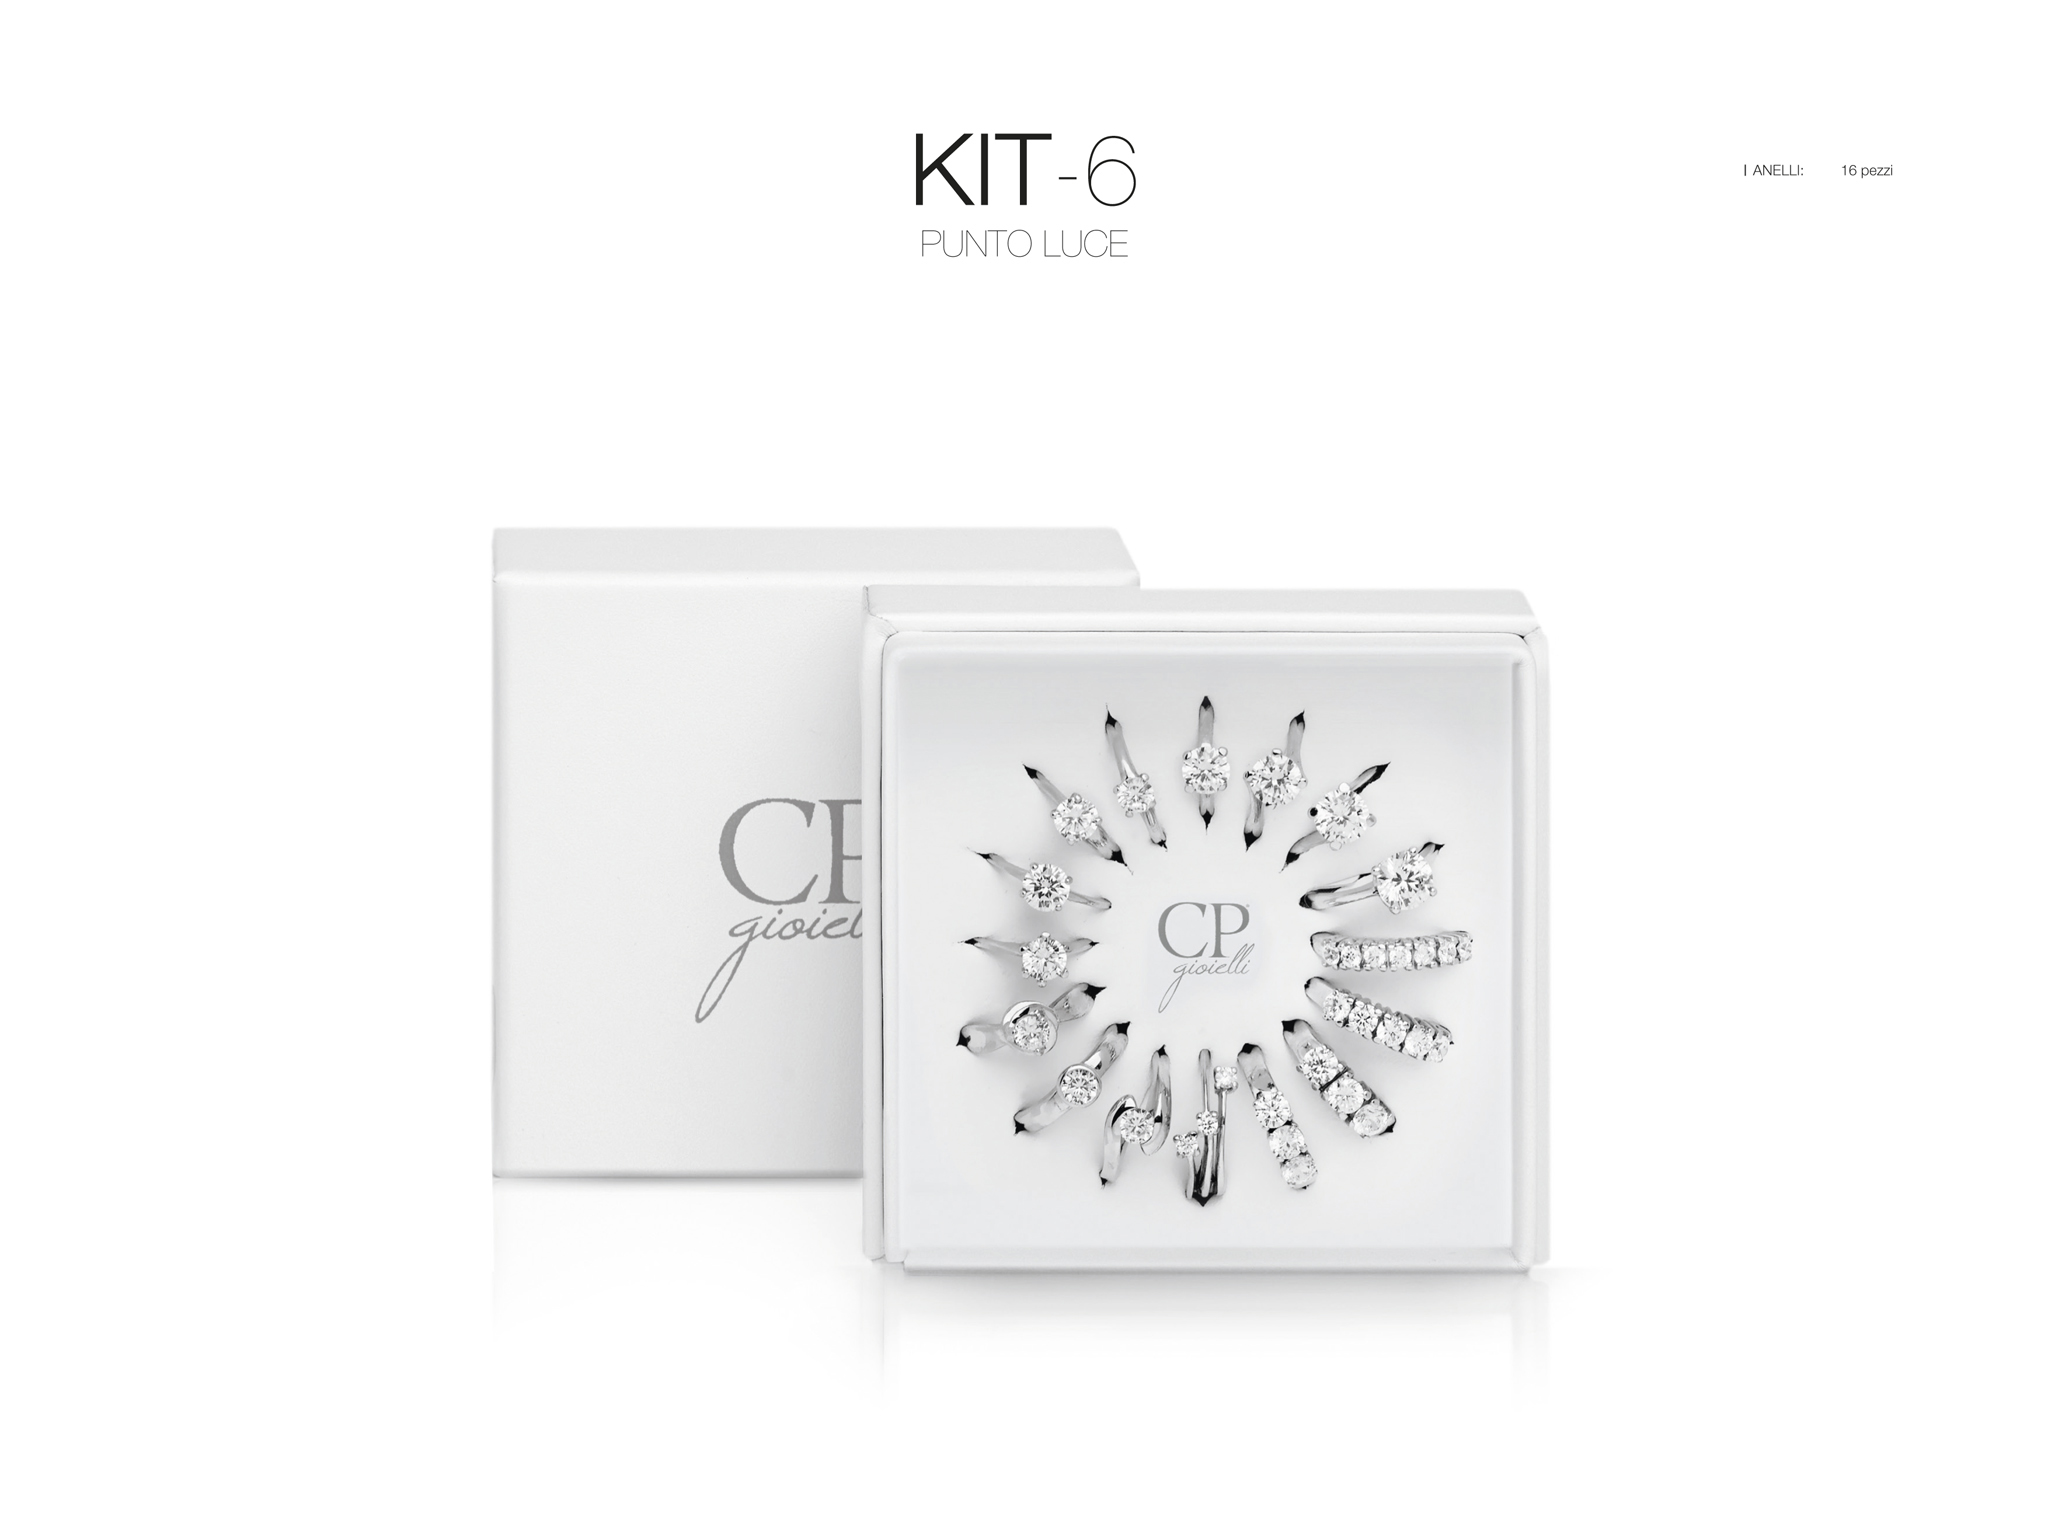 kit_argento_3.0_2016_pagina_26_APP